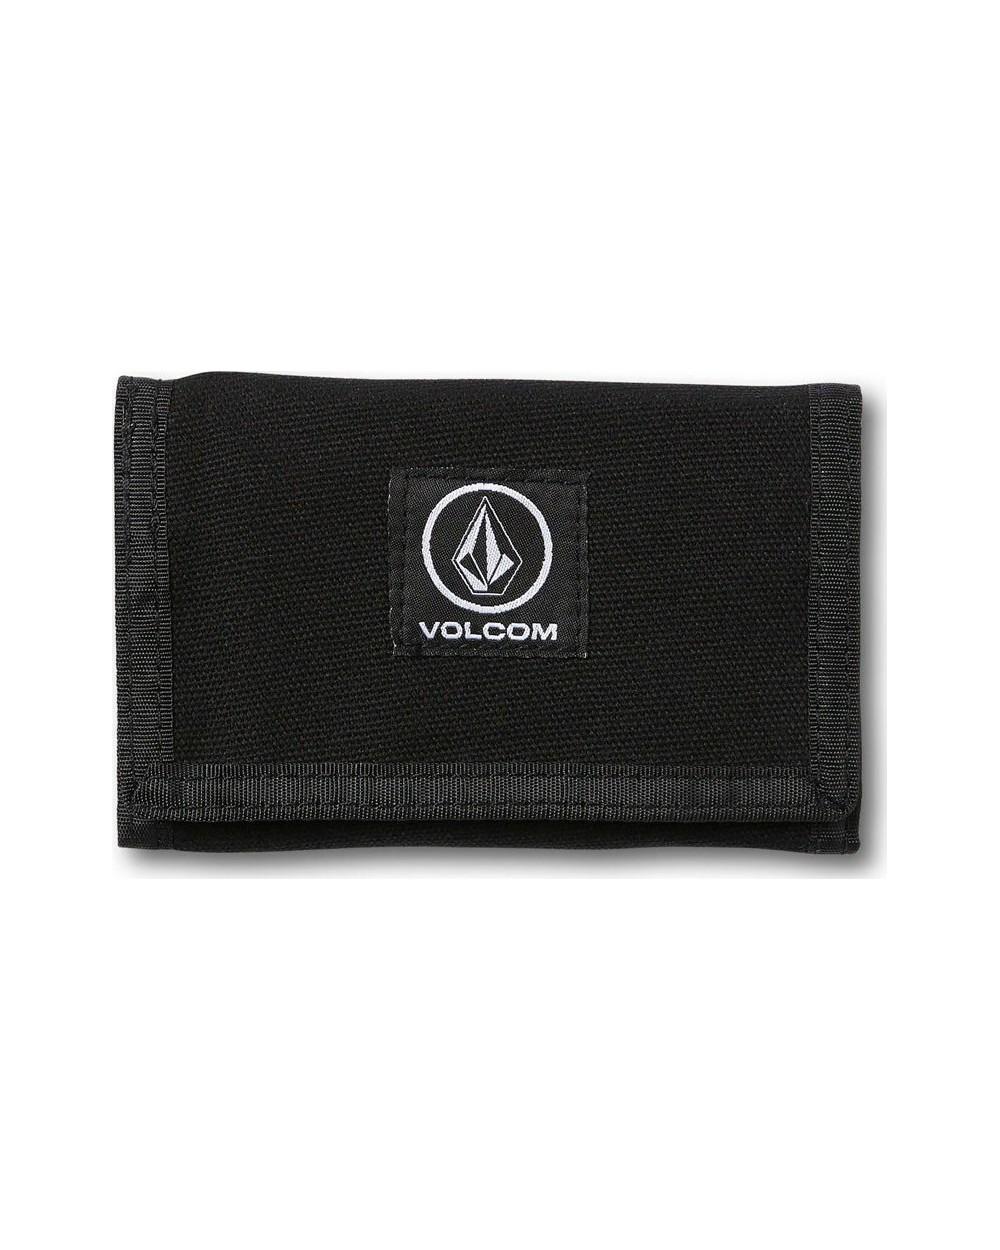 Volcom Box Stone Wallet - Black